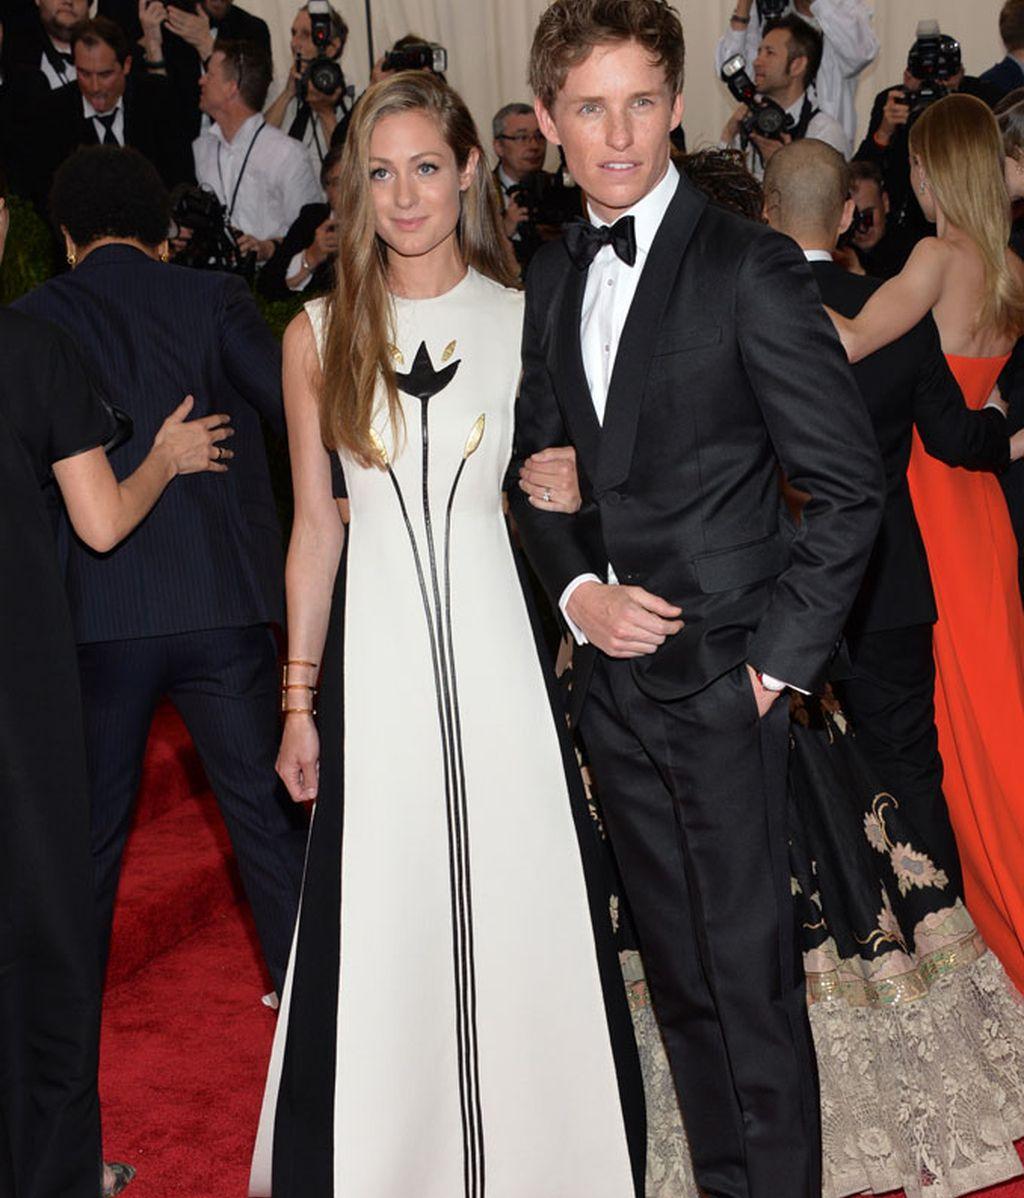 Hannah Bagshawe y su marido el actor Eddie Redmayne